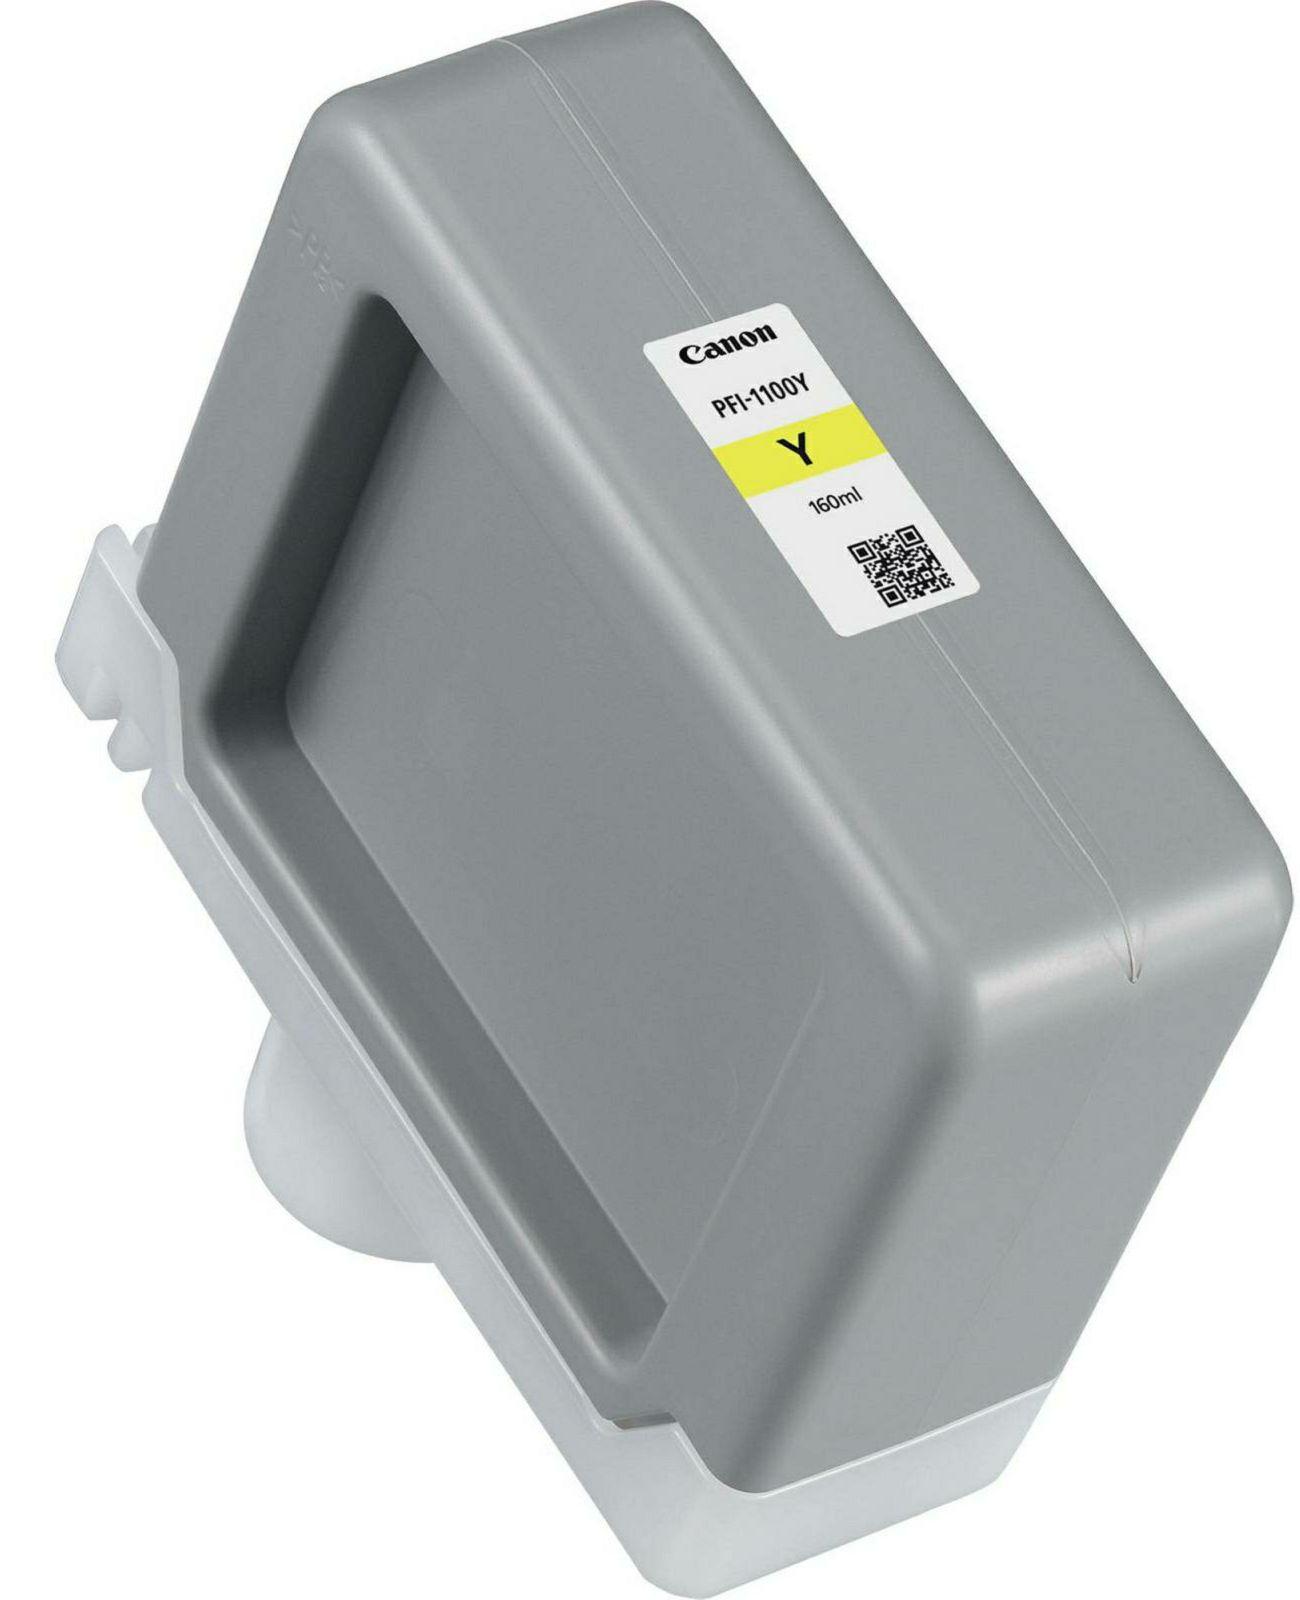 Canon Pigment Ink Tank PFI-1100 Yellow 160ml PFI1100Y žuta tinta za ploter imagePROGRAF PRO-2000, PRO-4000, PRO-4000S, PRO-6000, PRO-6000S Large-Format Printers (0853C001AA)